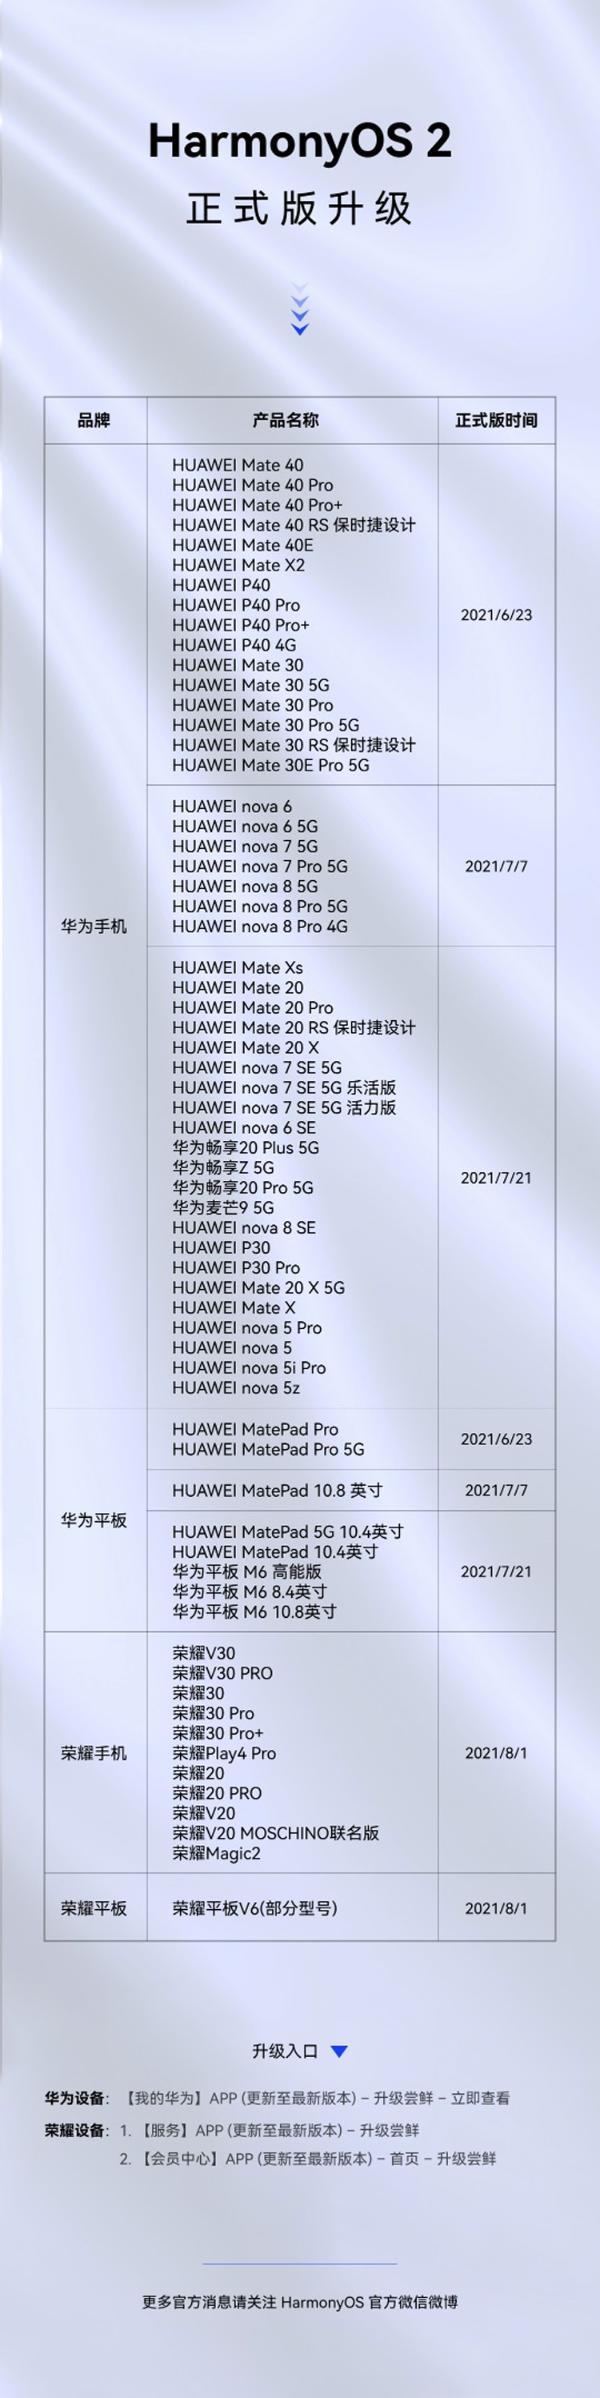 HarmonyOS 2升级服务已覆盖94款机型,其中65款机型可升级正式版本